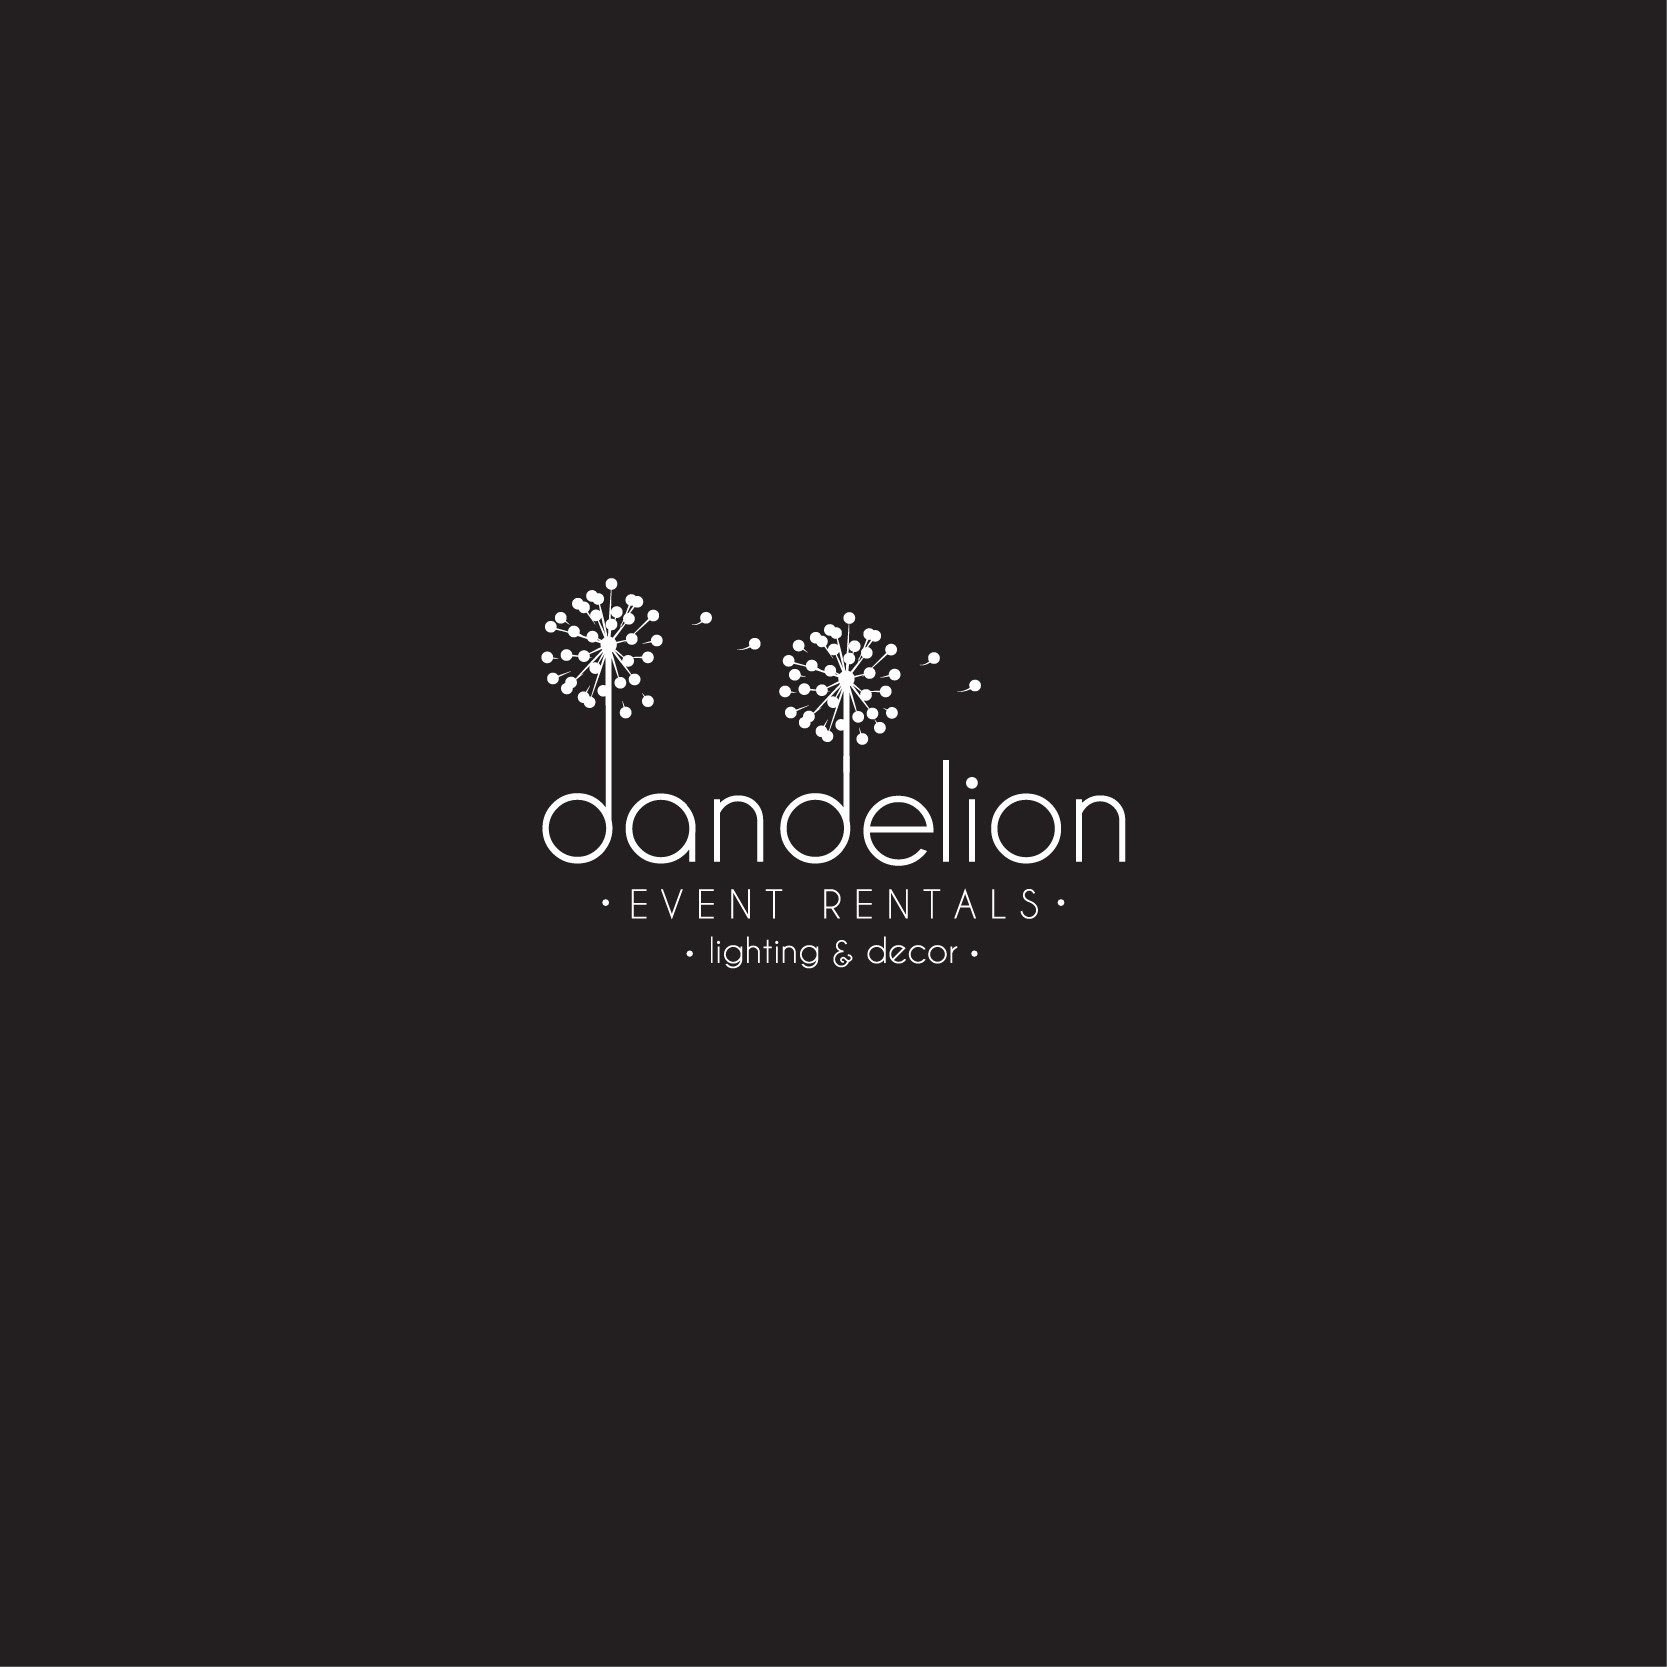 Create a modern chic logo for Dandelion Event Rentals!